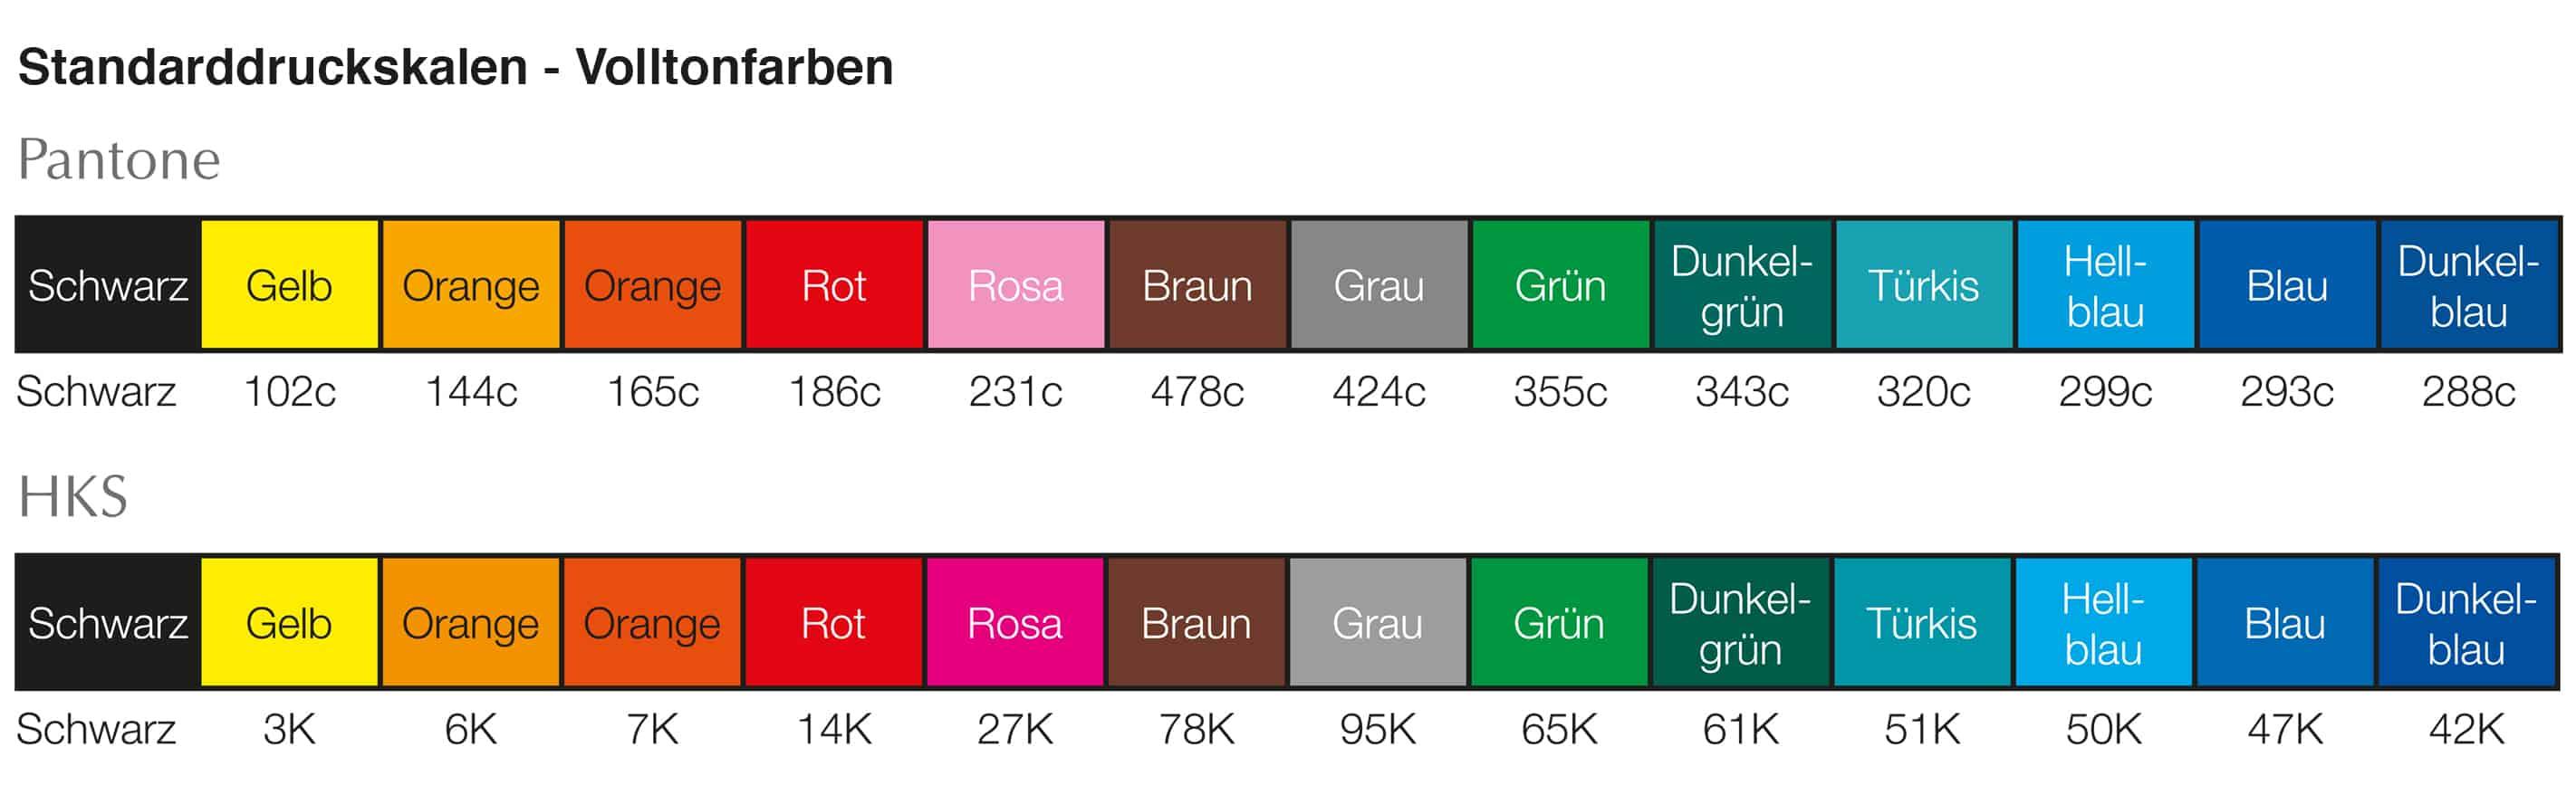 Standarddruckfarben